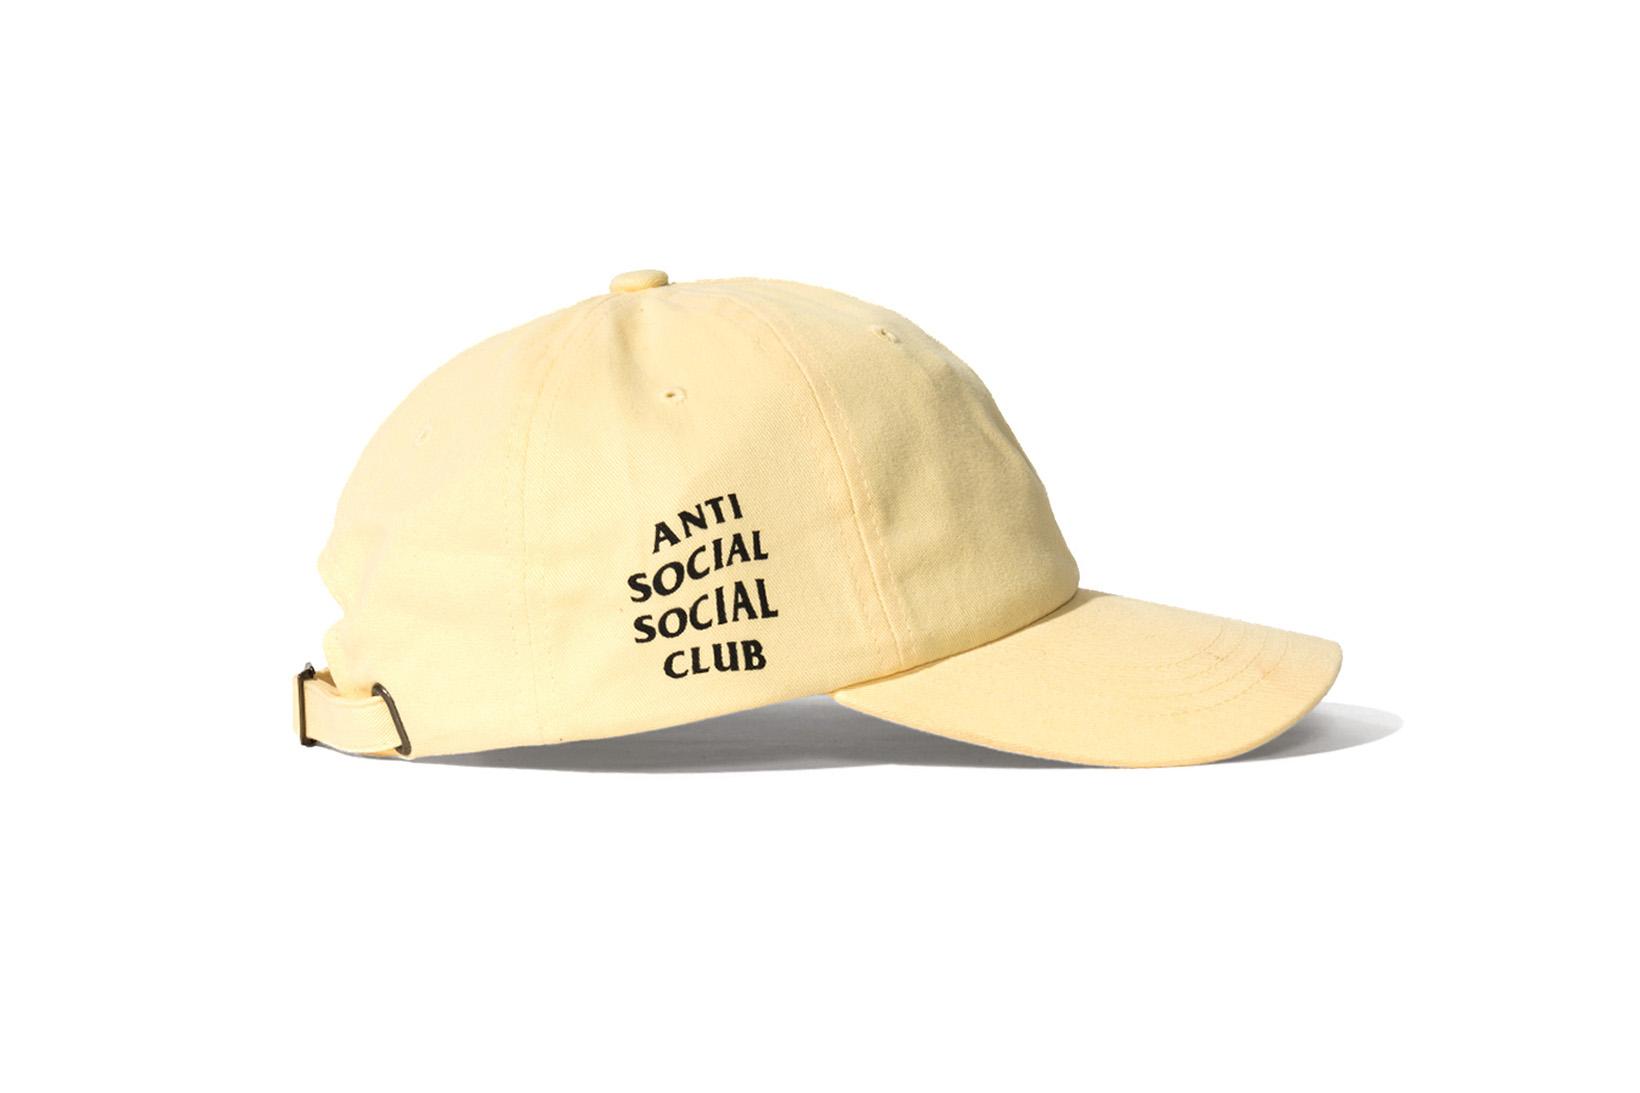 Anti Social Social Club 2017 Spring Summer - 3744377